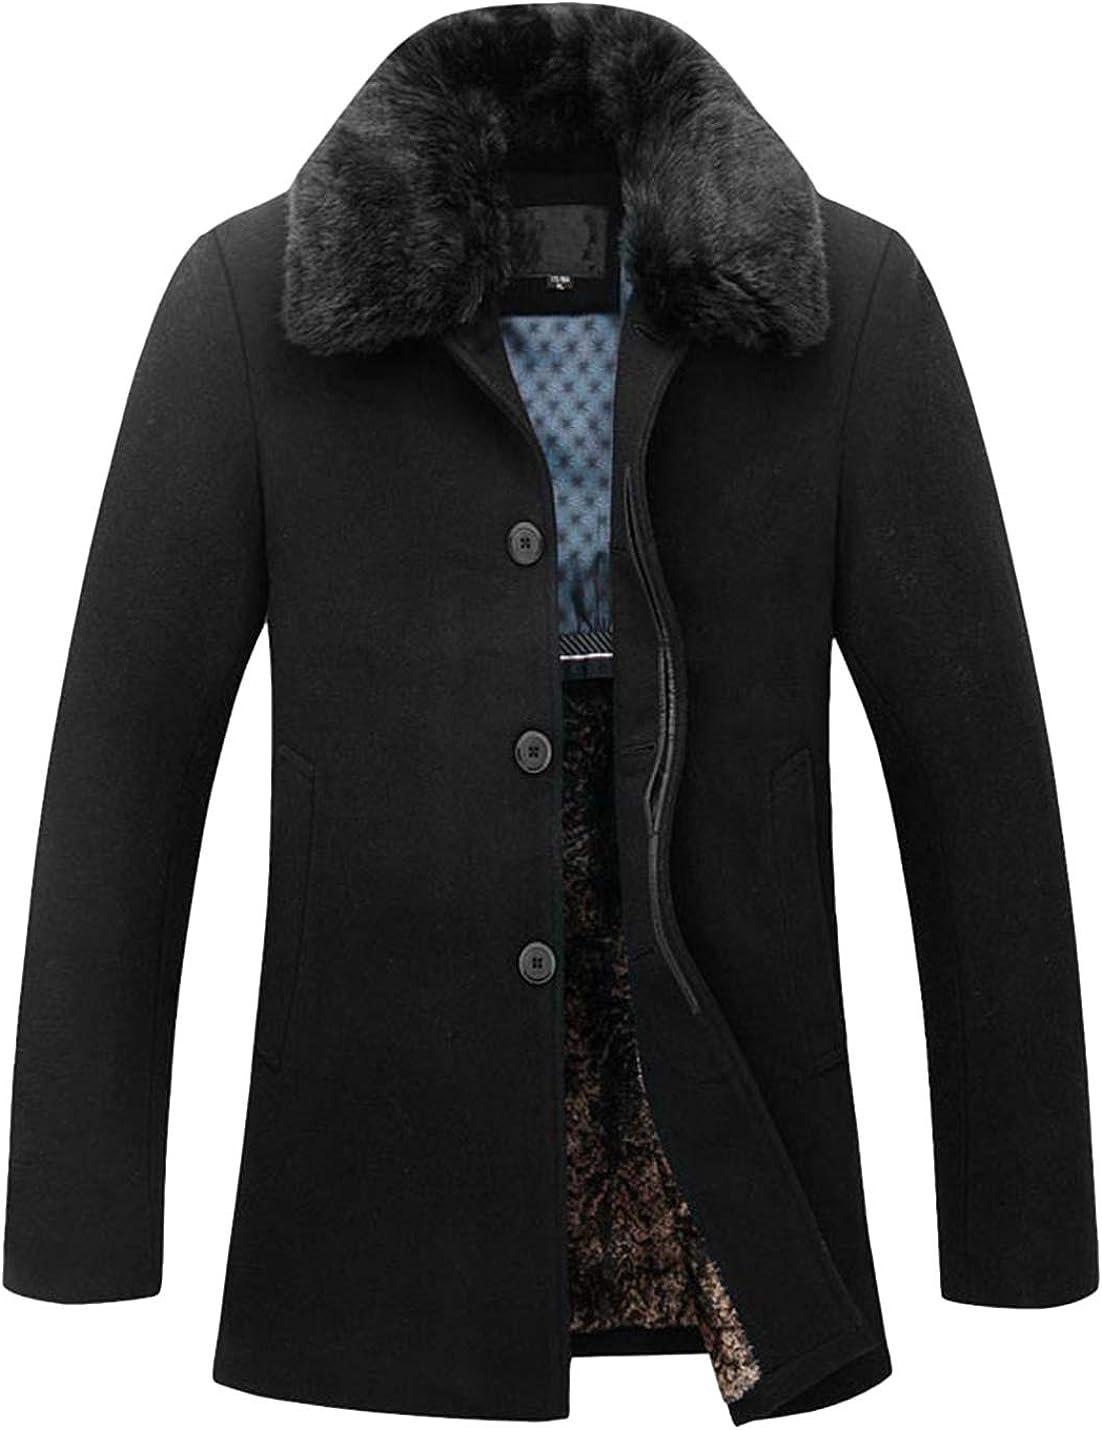 Springrain Men's Sherpa Lining Long Sleeve Winter Wool-Blend Jacket Single Breasted Pea Coat with Detachable Fur Collar